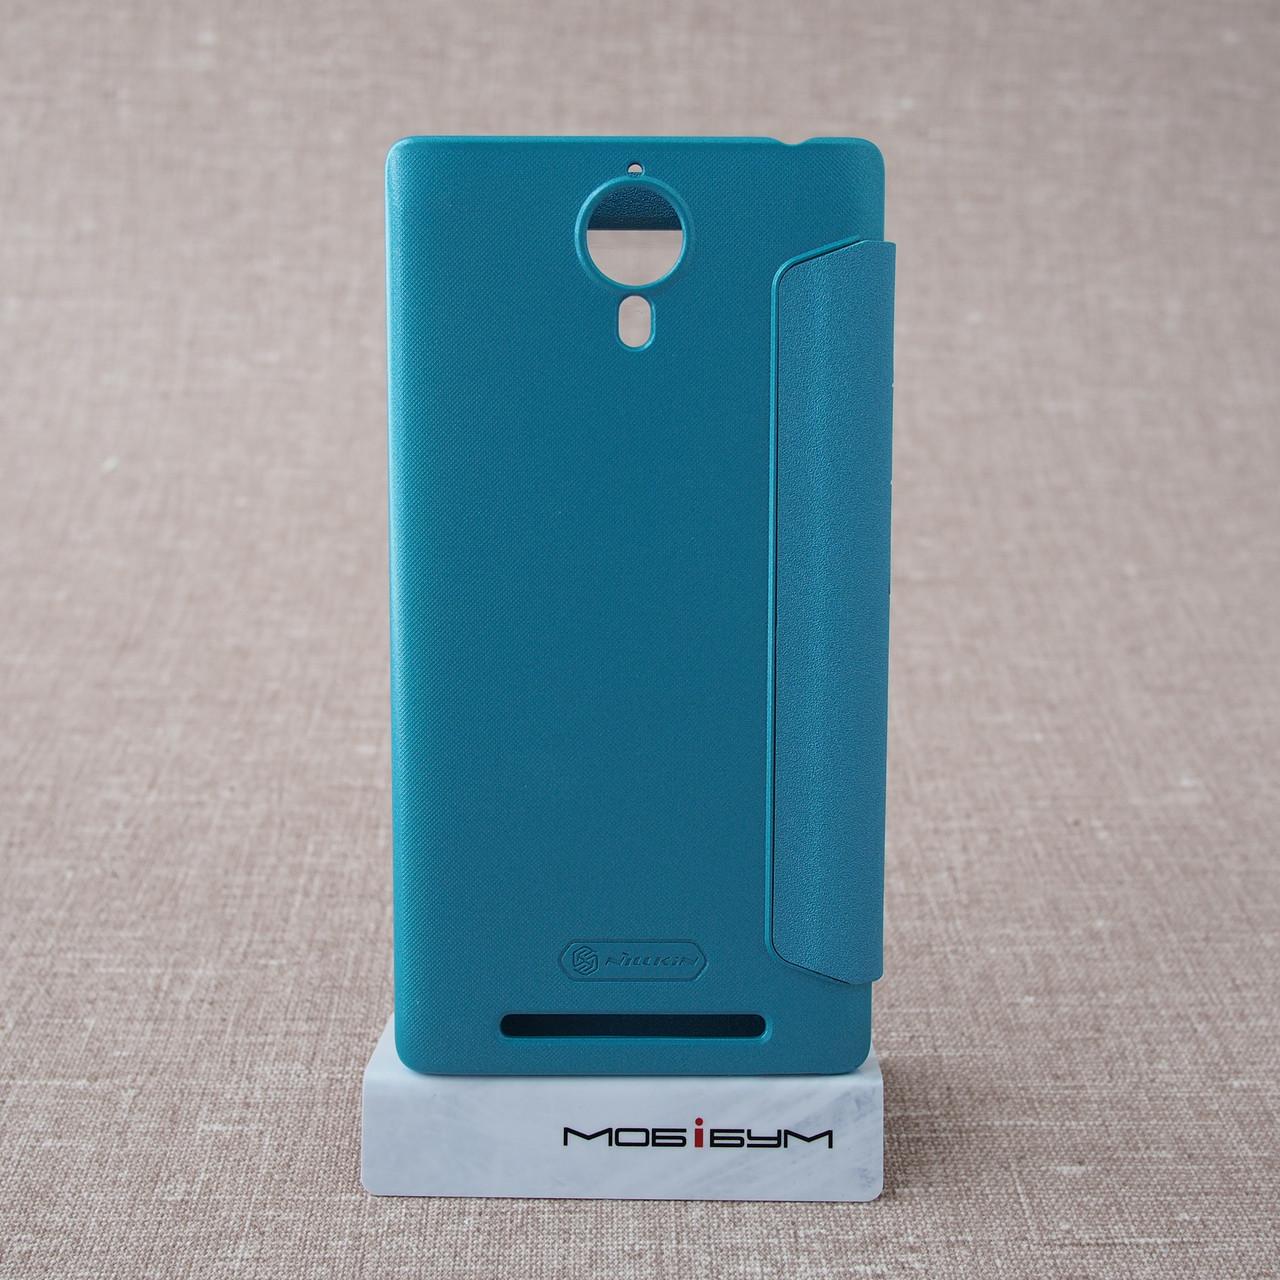 Чехлы для других смартфонов Nillkin Sparkle Lenovo P90 K80 turquoise Для телефона